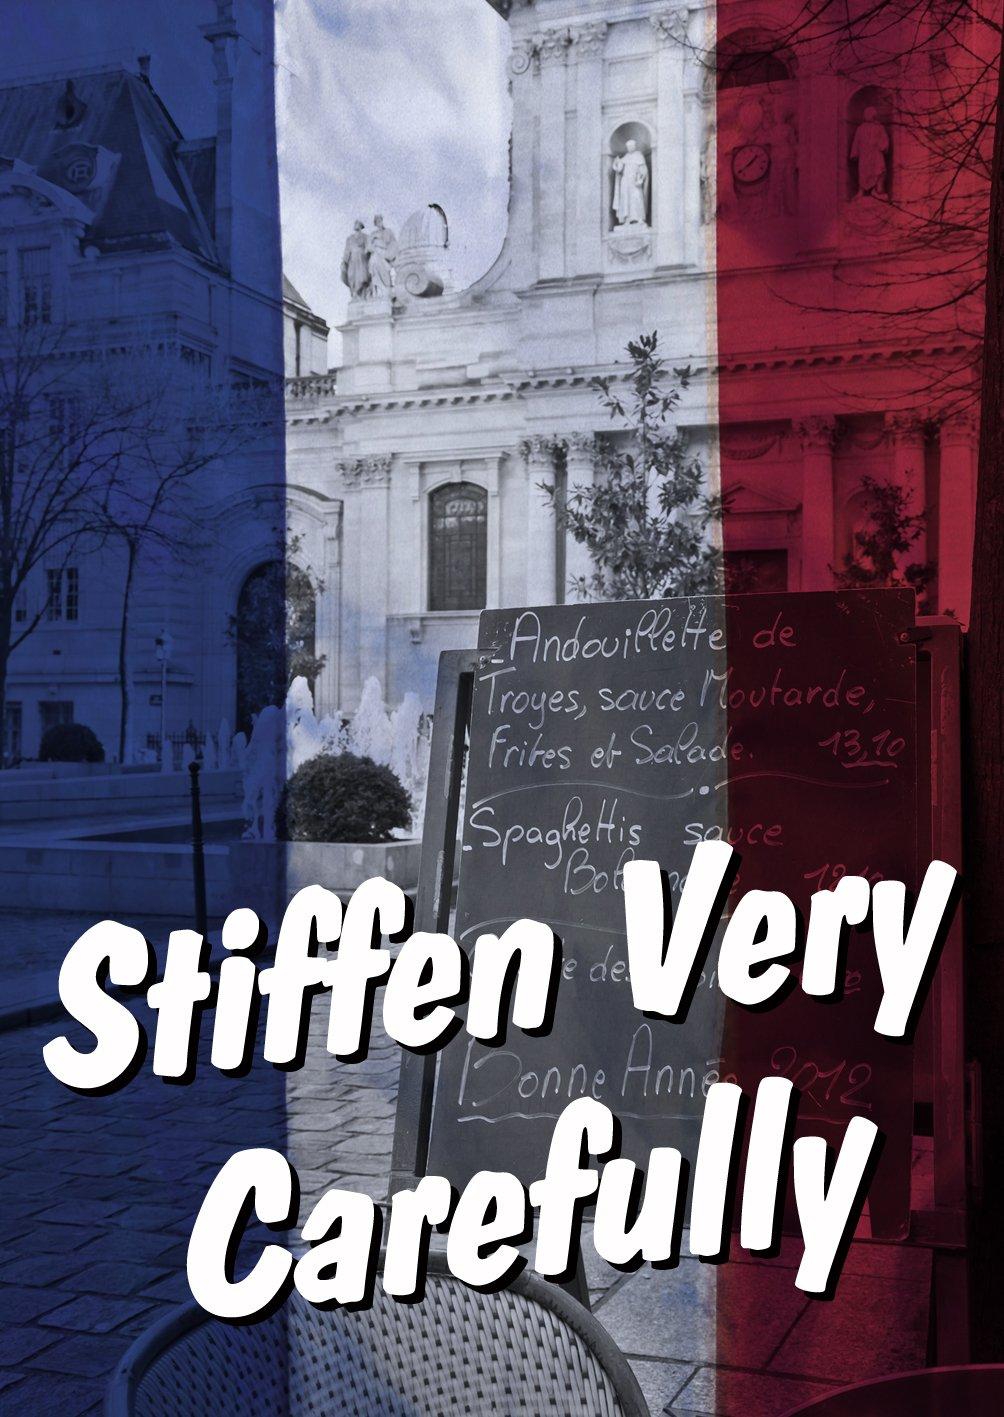 【返品送料無料】 Stiffen Very Carefully Stiffen players - 14 murder mystery game for 14 players B00BEUBLJ4, 和気郡:33c8fe80 --- hohpartnership-com.access.secure-ssl-servers.biz